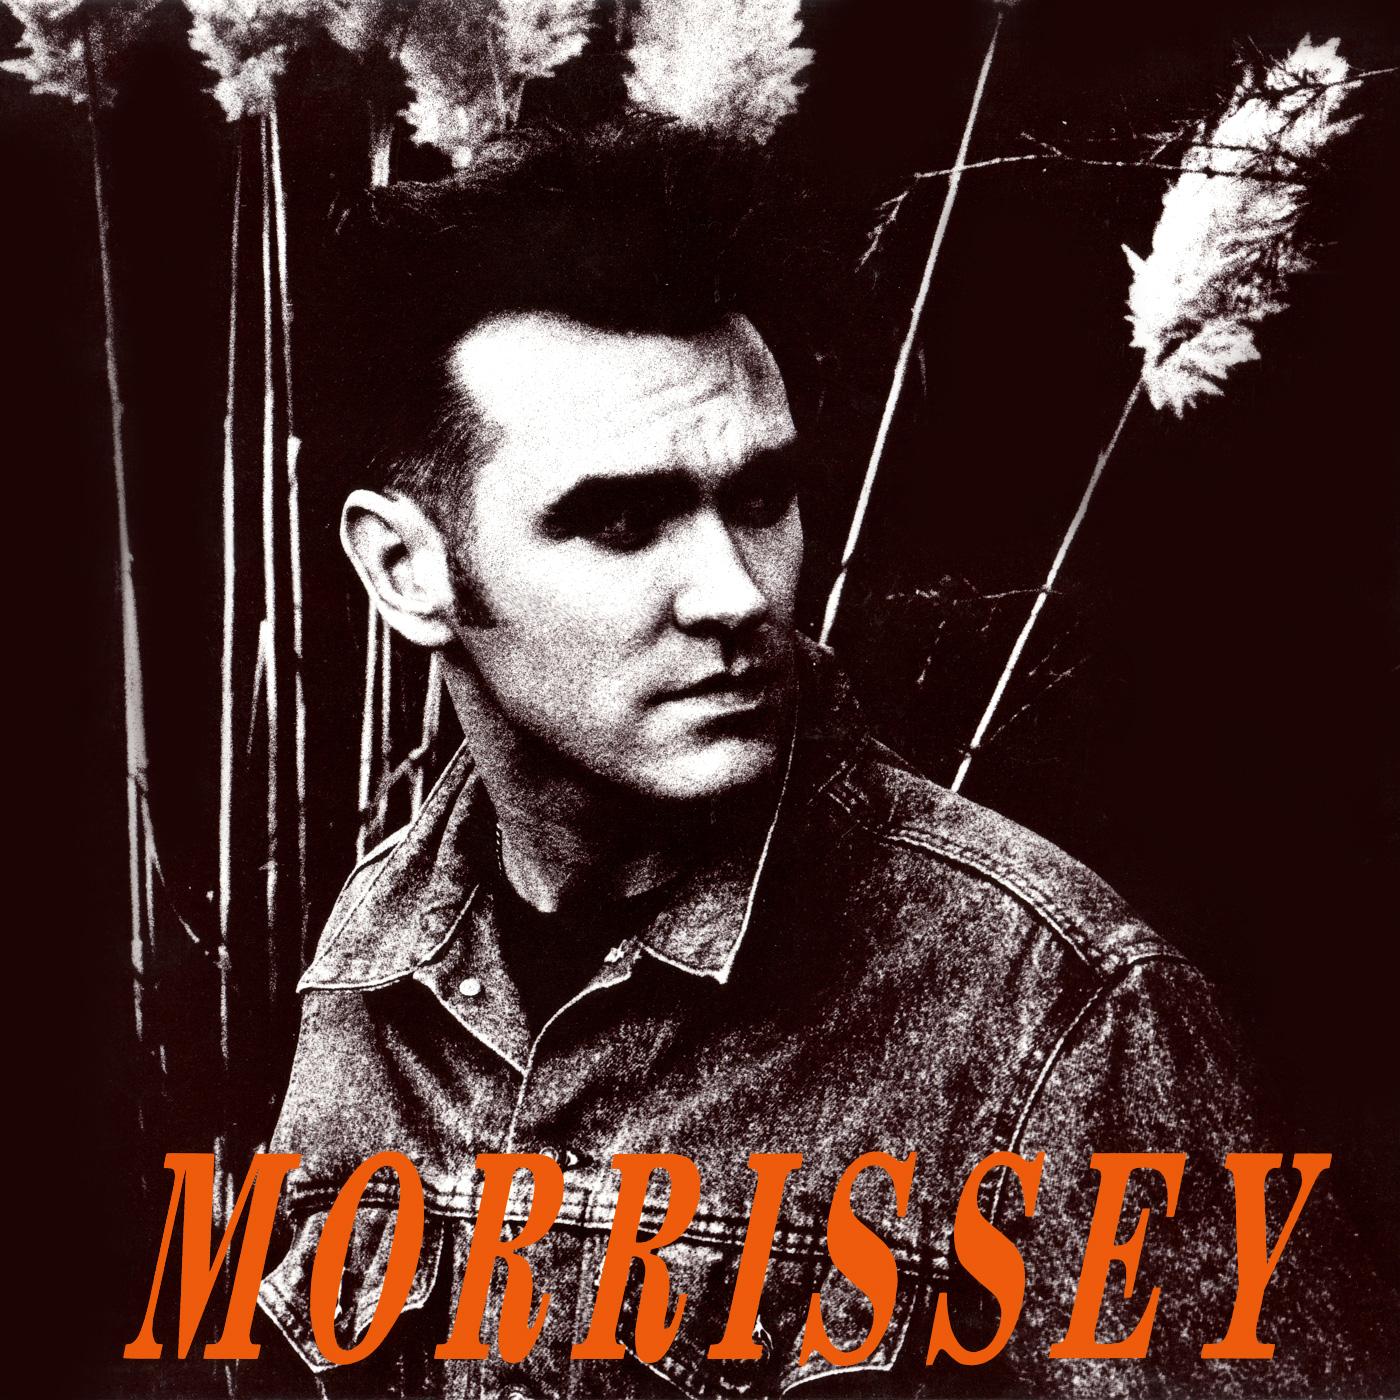 1990 - November Spawned A Monster